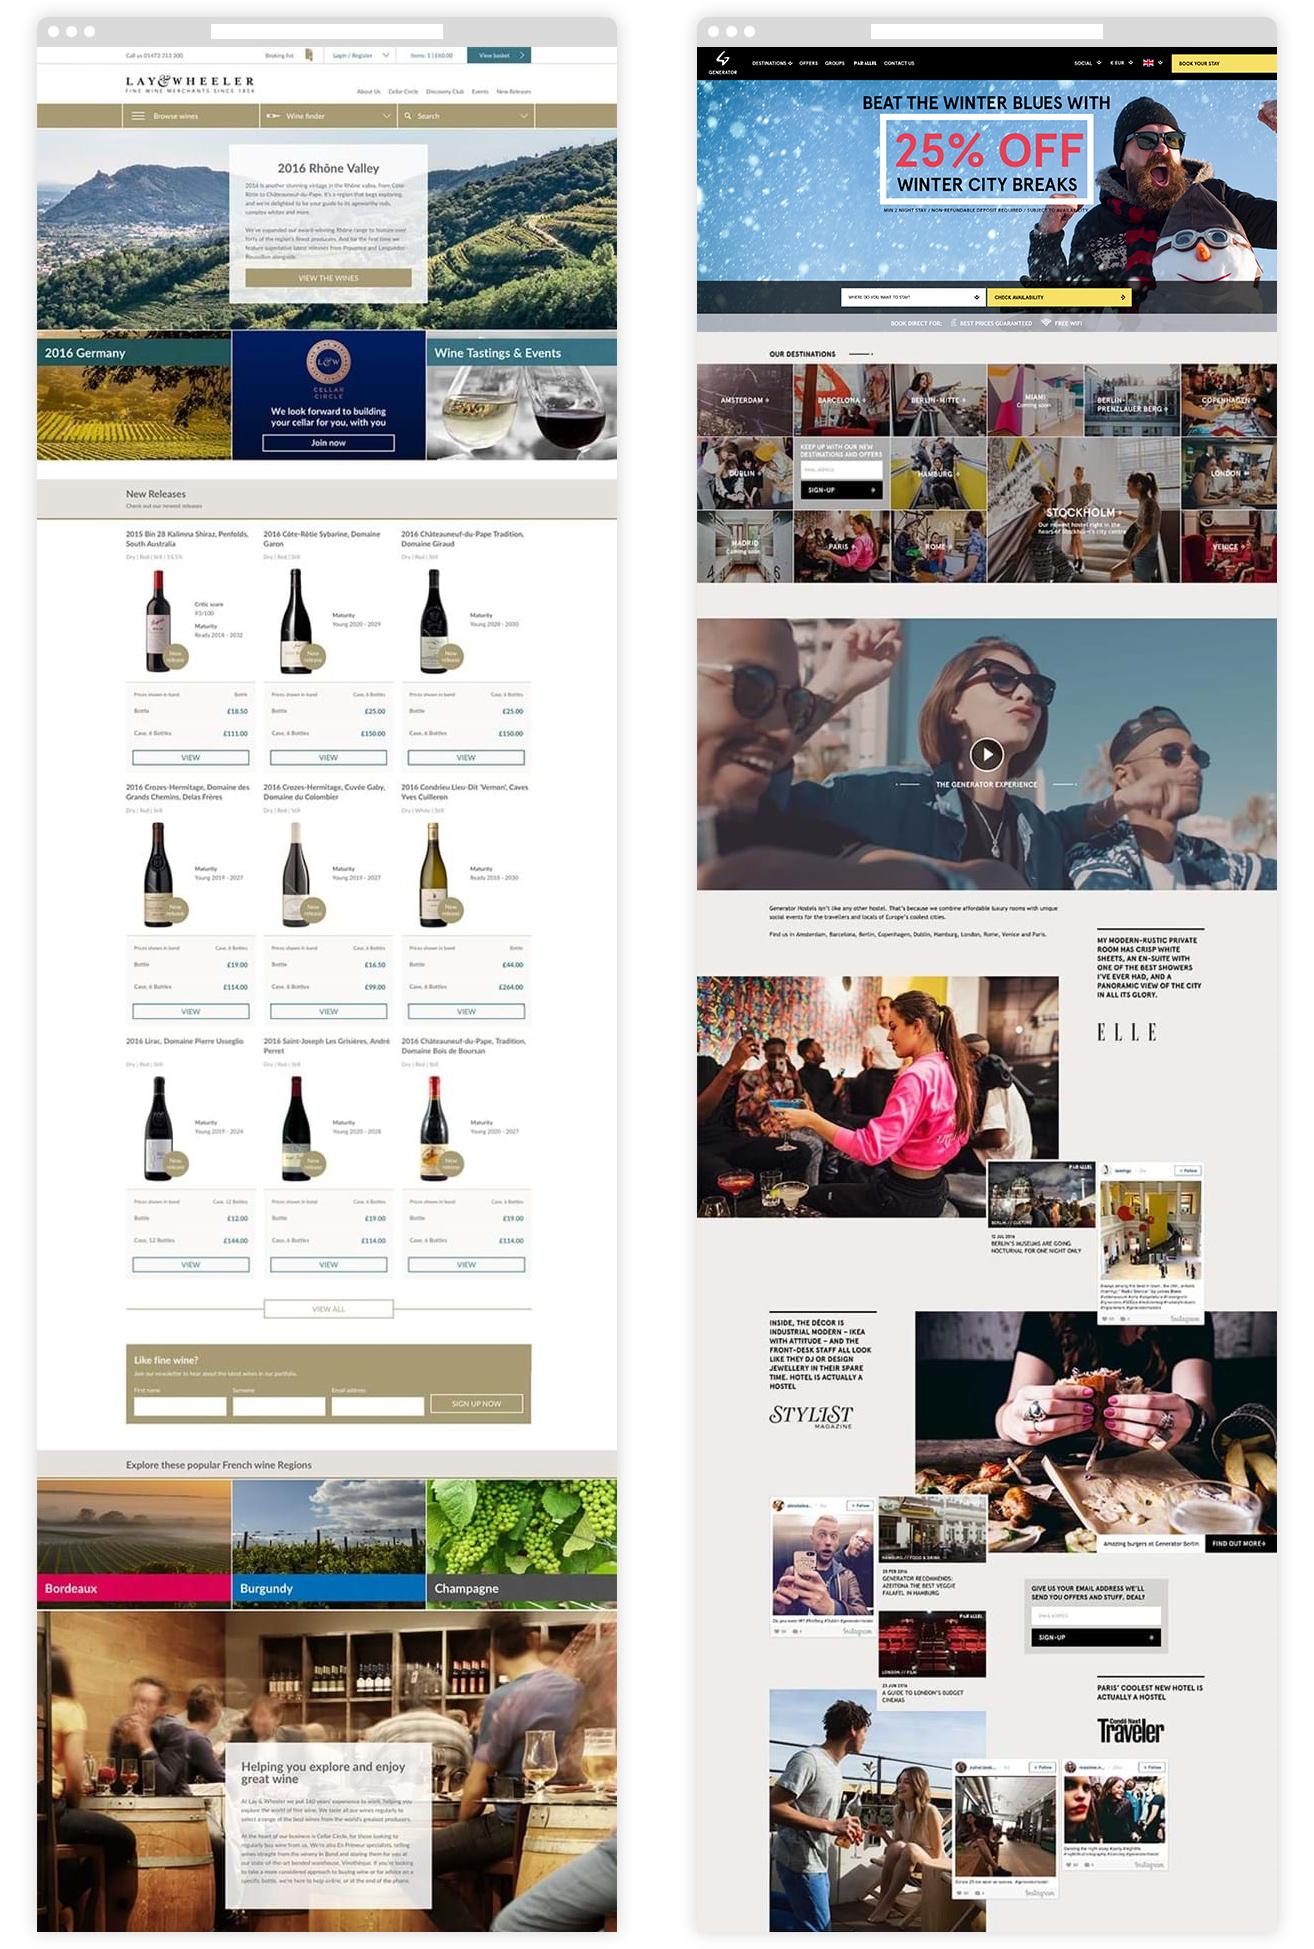 Lay & Wheeler and Generator Hostels web visuals